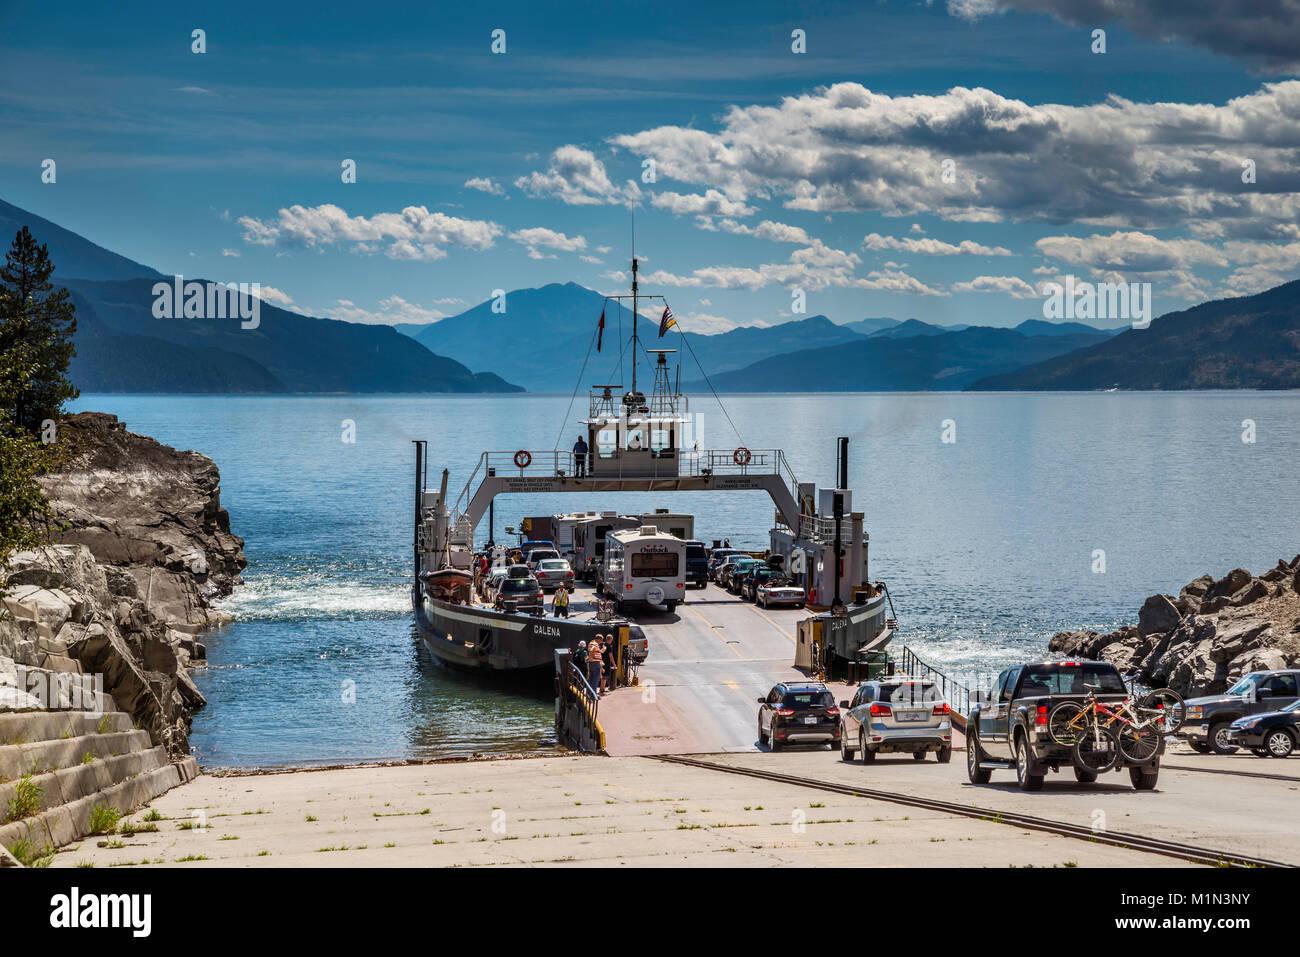 Vehicles entering MV Galena ferry in Shelter Bay to cross Upper Arrow Lake to Galena Bay, Monashee Mtns, West Kootenay, British Columbia, Canada Stock Photo